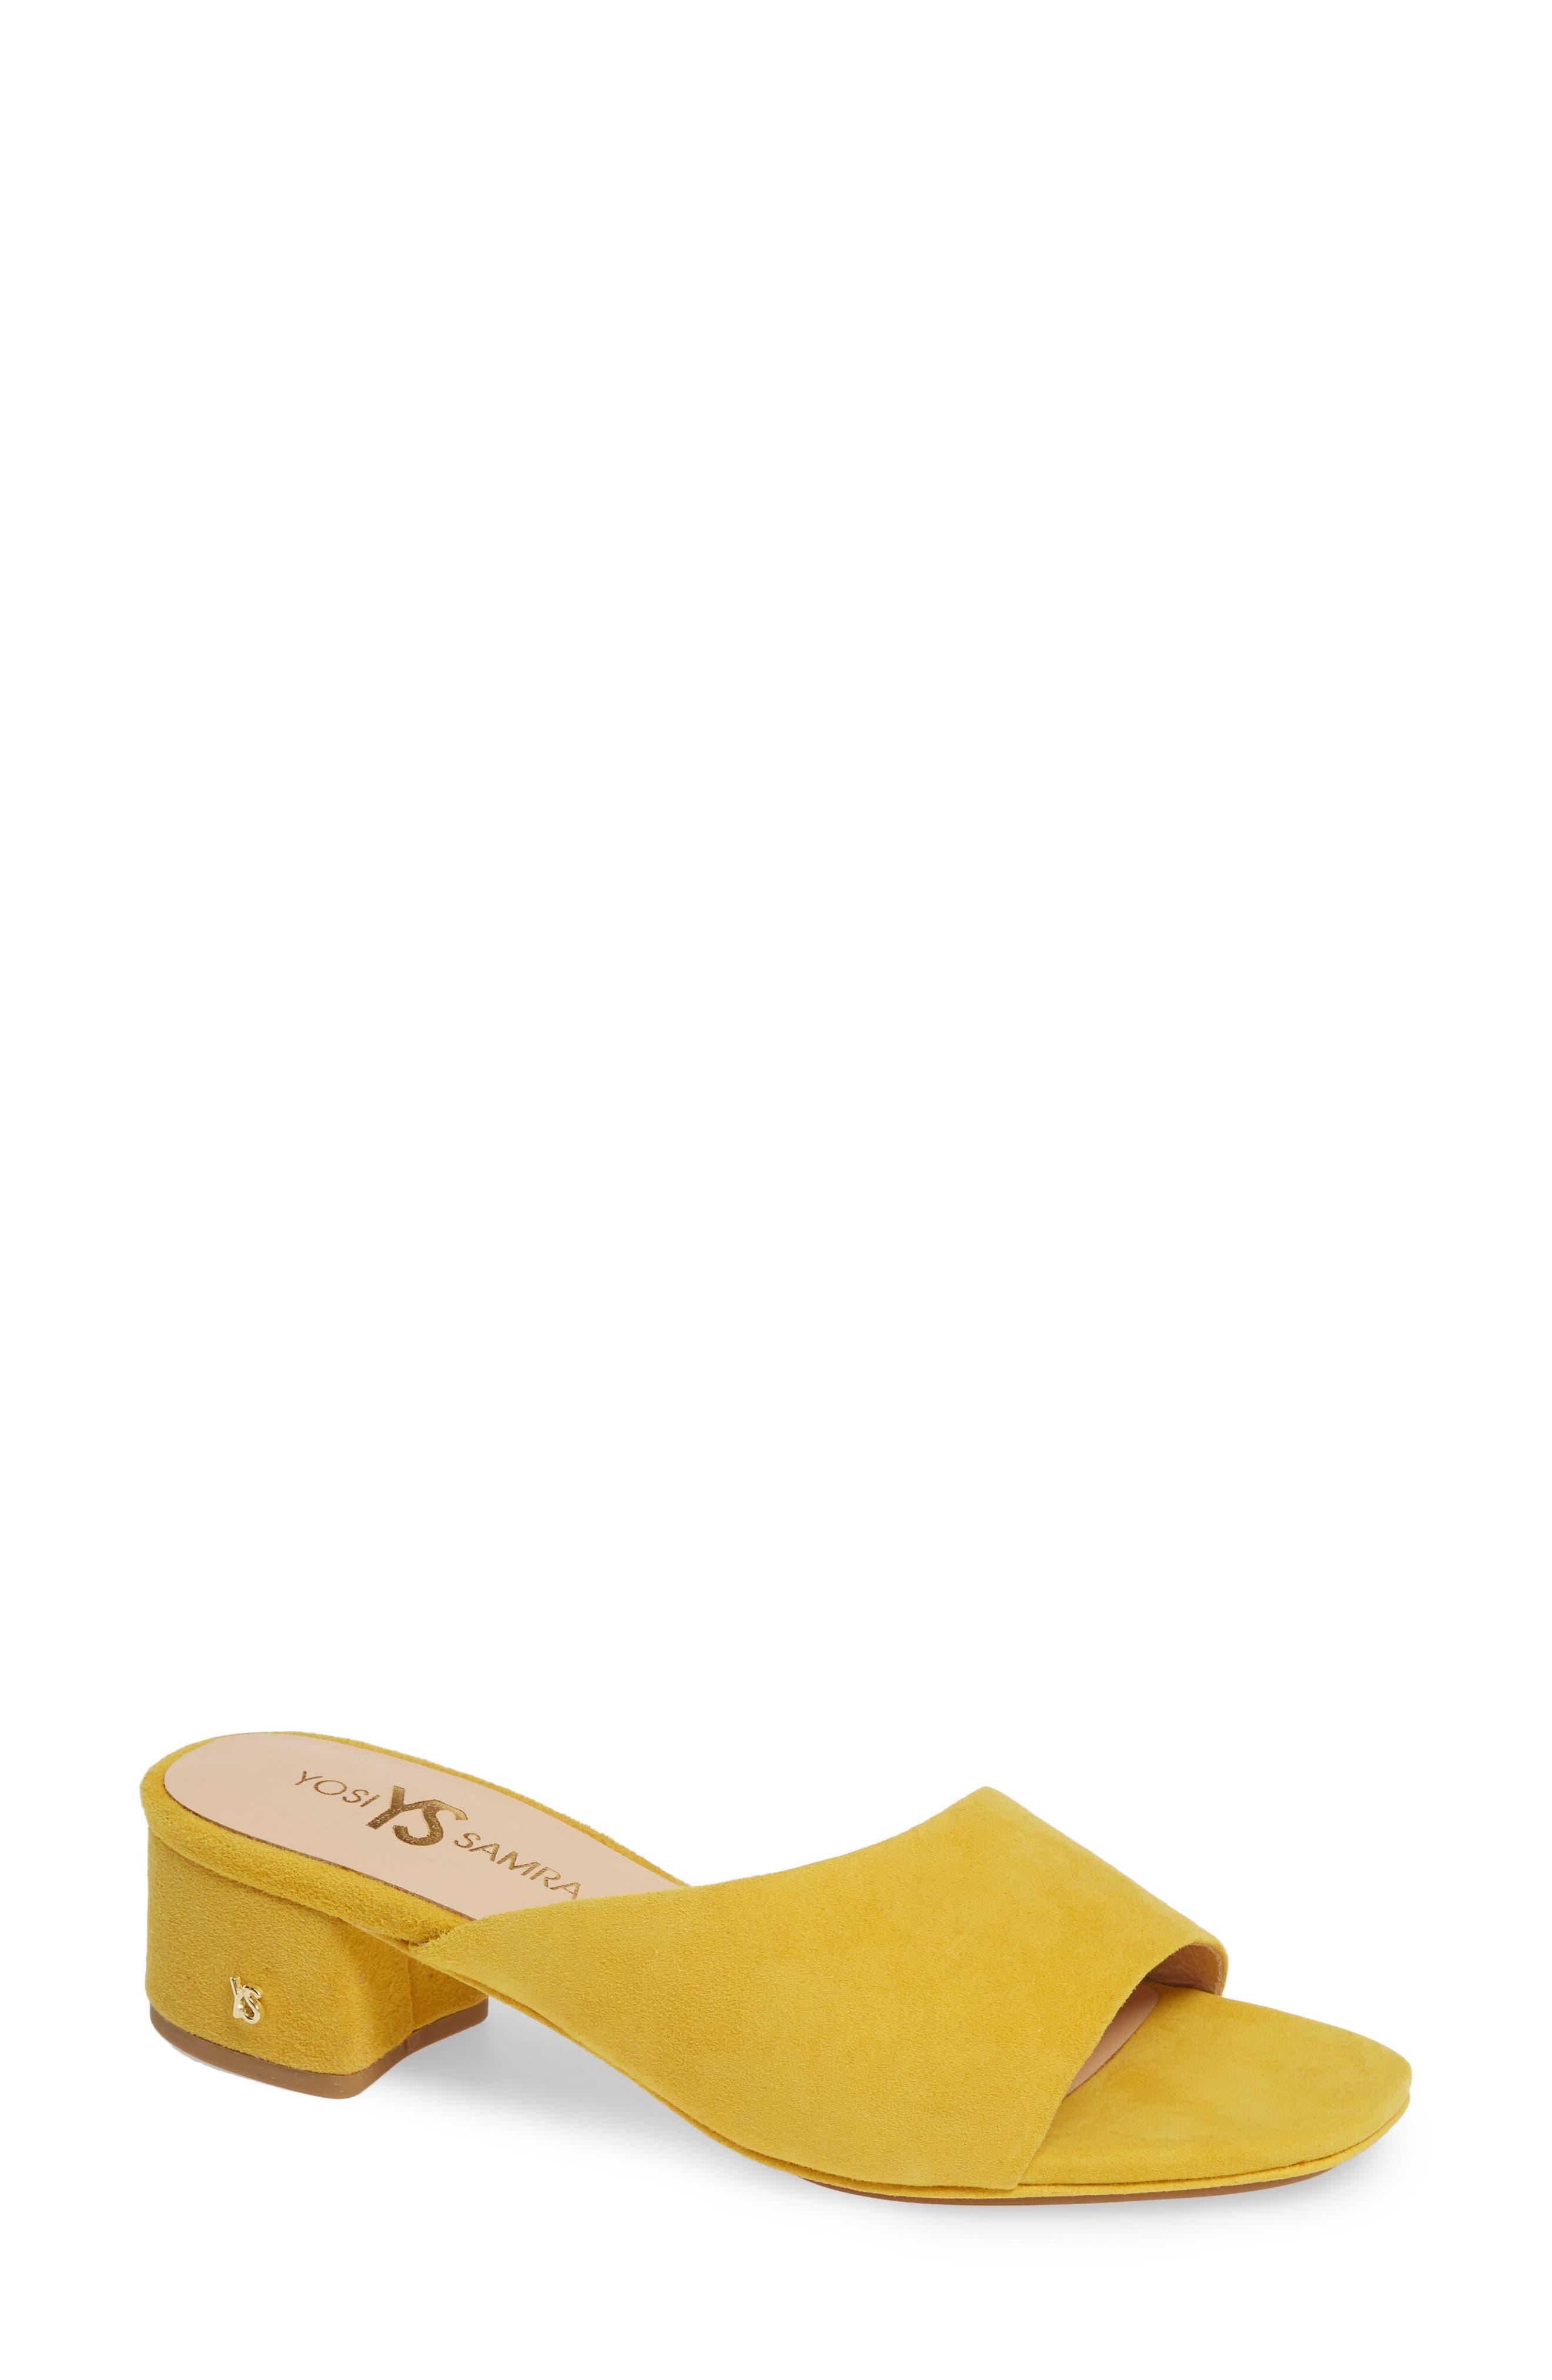 YOSI SAMRA Dante Slide Sandal in Yellow Suede